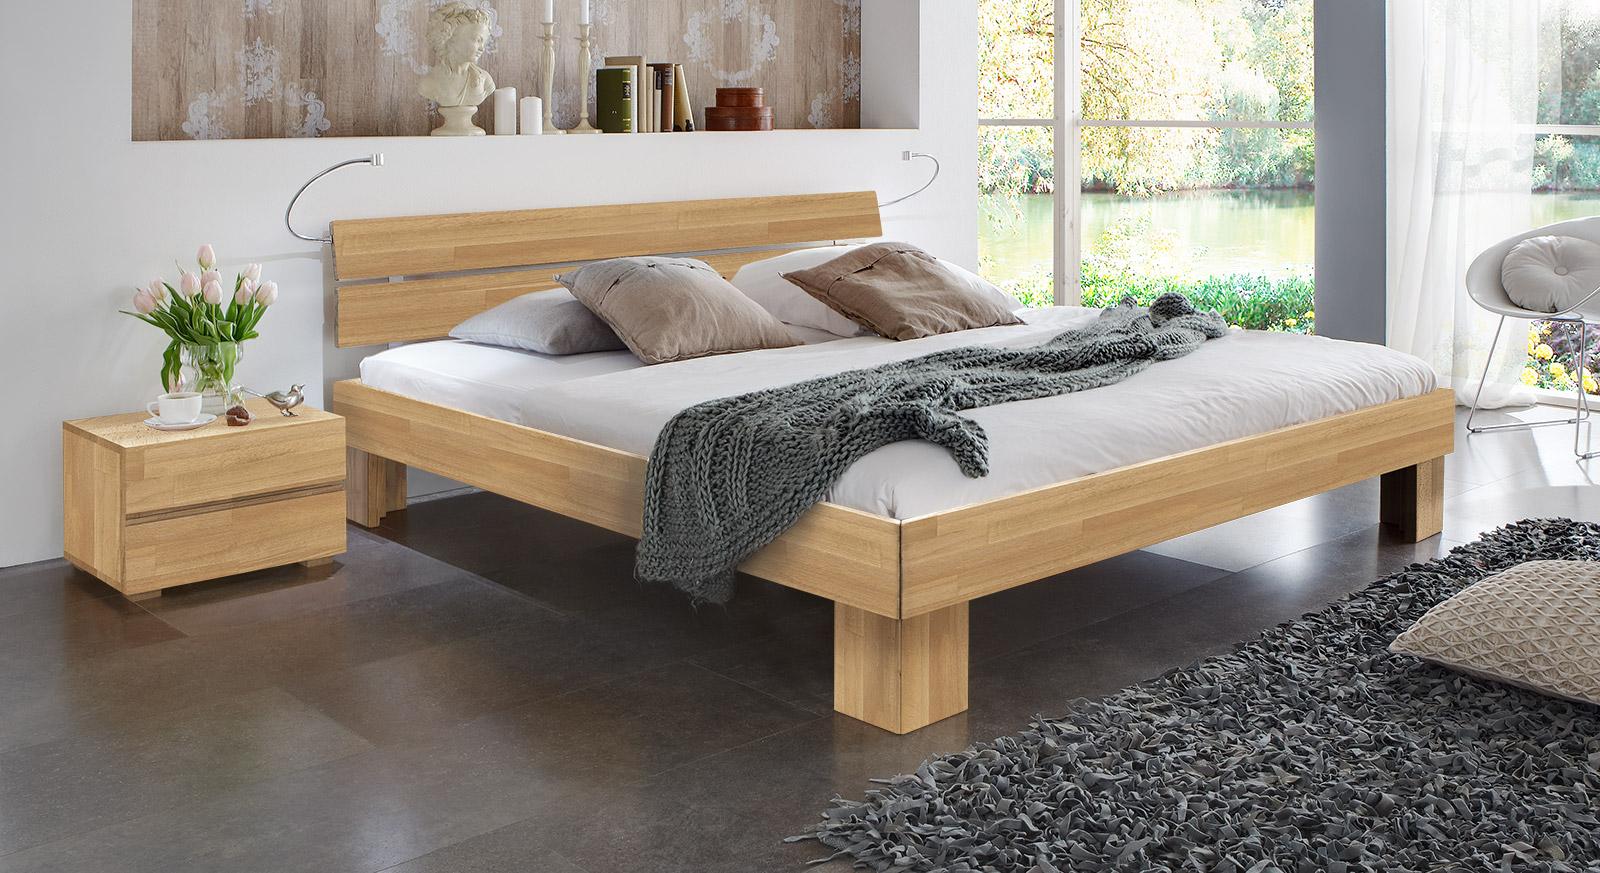 Massivholzbett Maidstone mit passenden Produkten